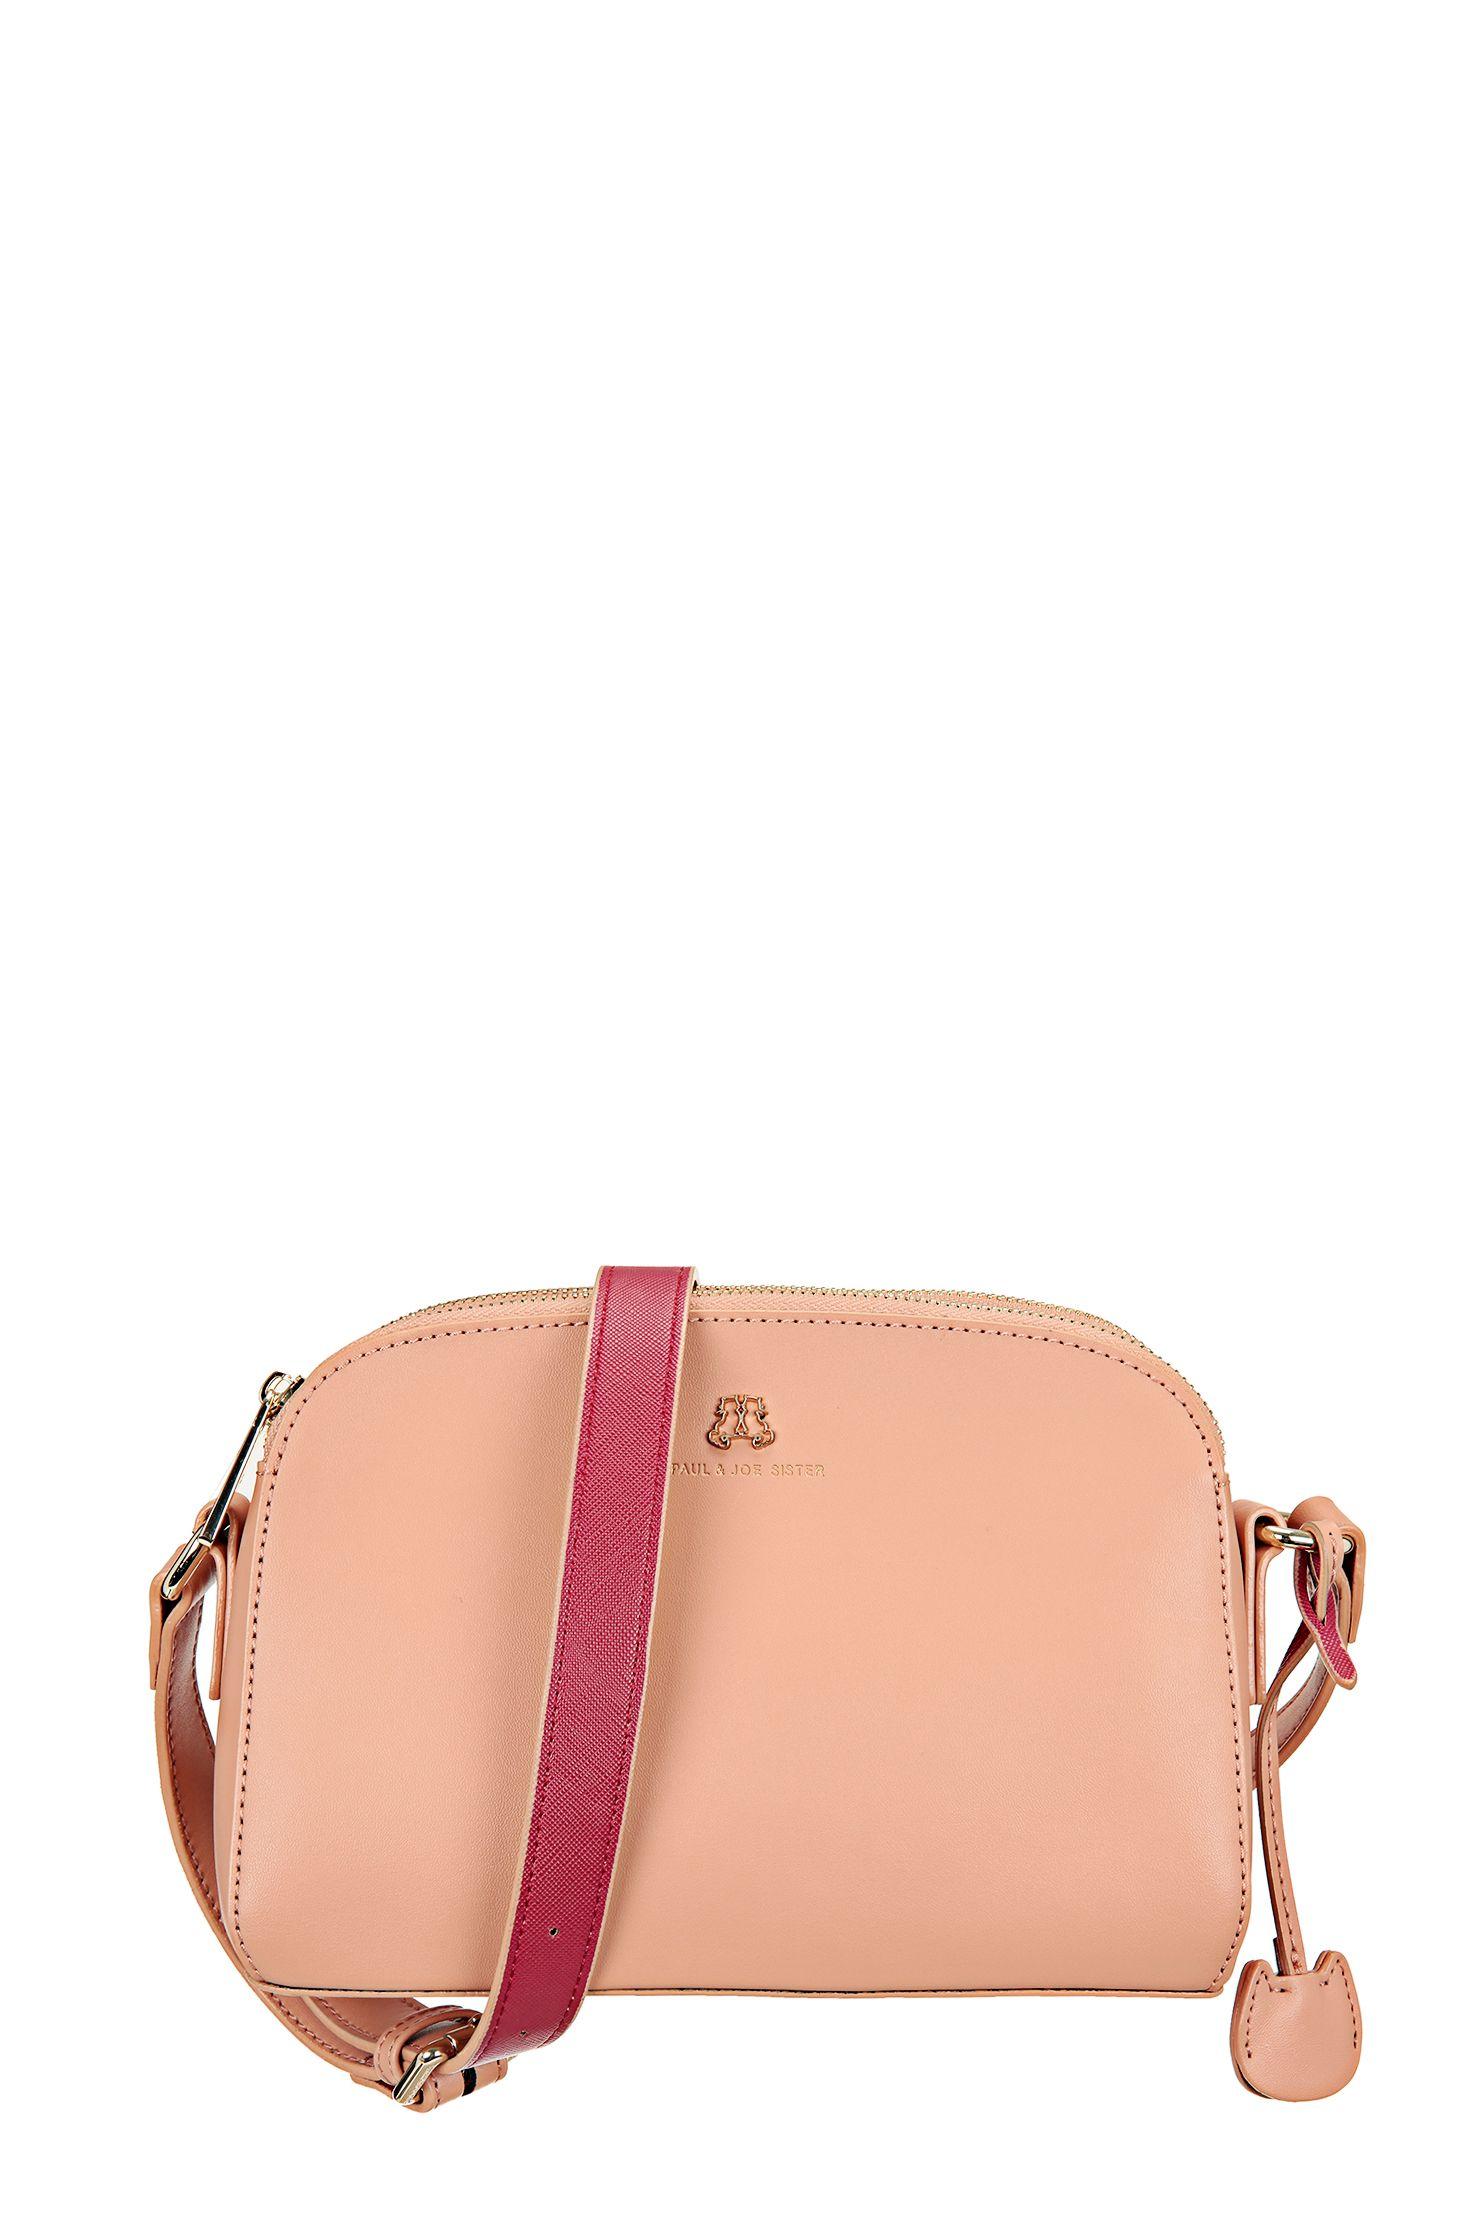 Leather Bag Erin Pink Paul Joe Sister On Monshowroom